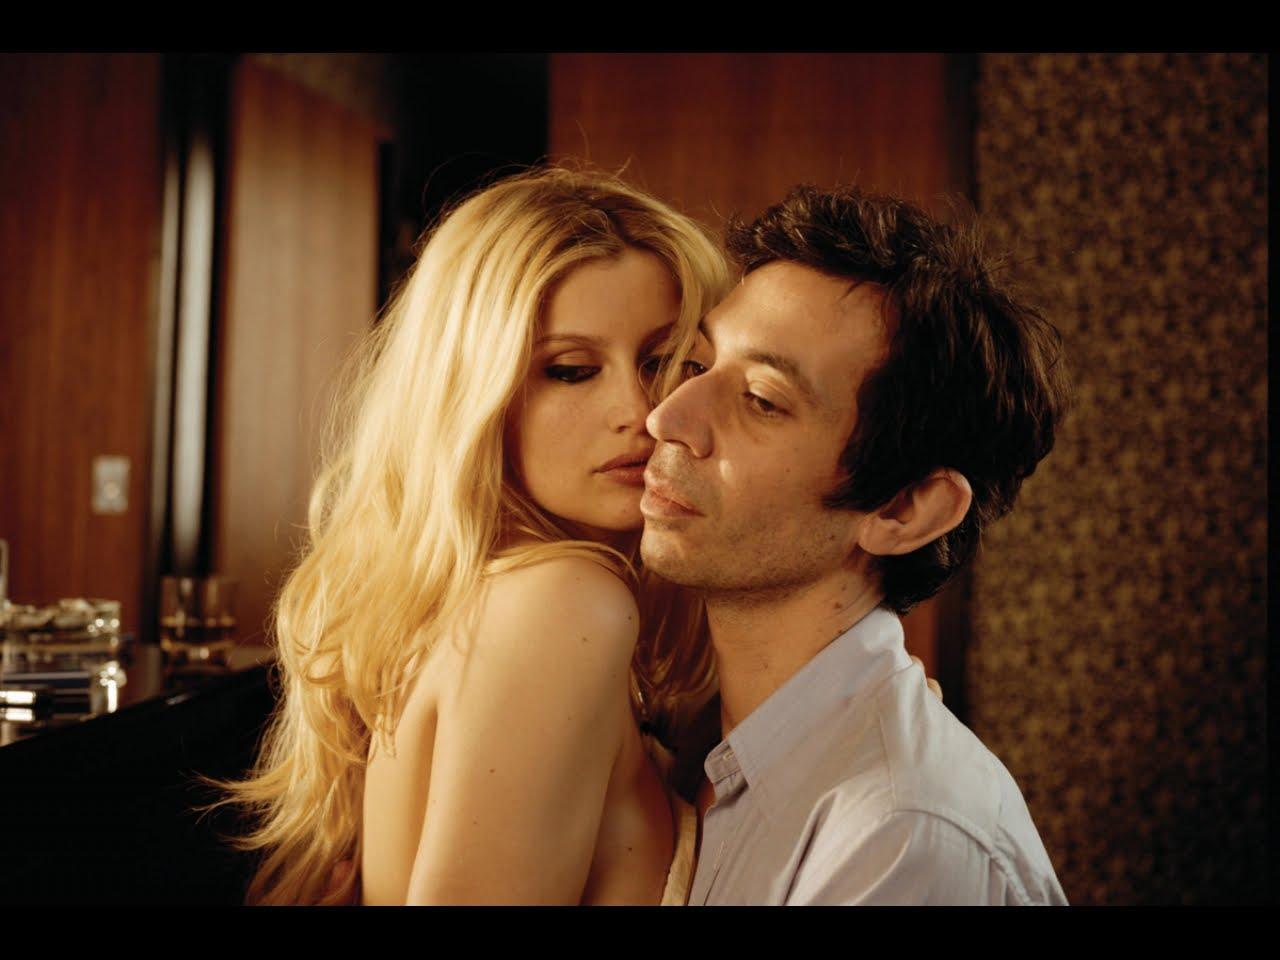 http://4.bp.blogspot.com/_vbCvs73V4MI/TBaBCW8iSyI/AAAAAAAAAPU/_QNHlg2rvxY/s1600/Gainsbourg1.JPG